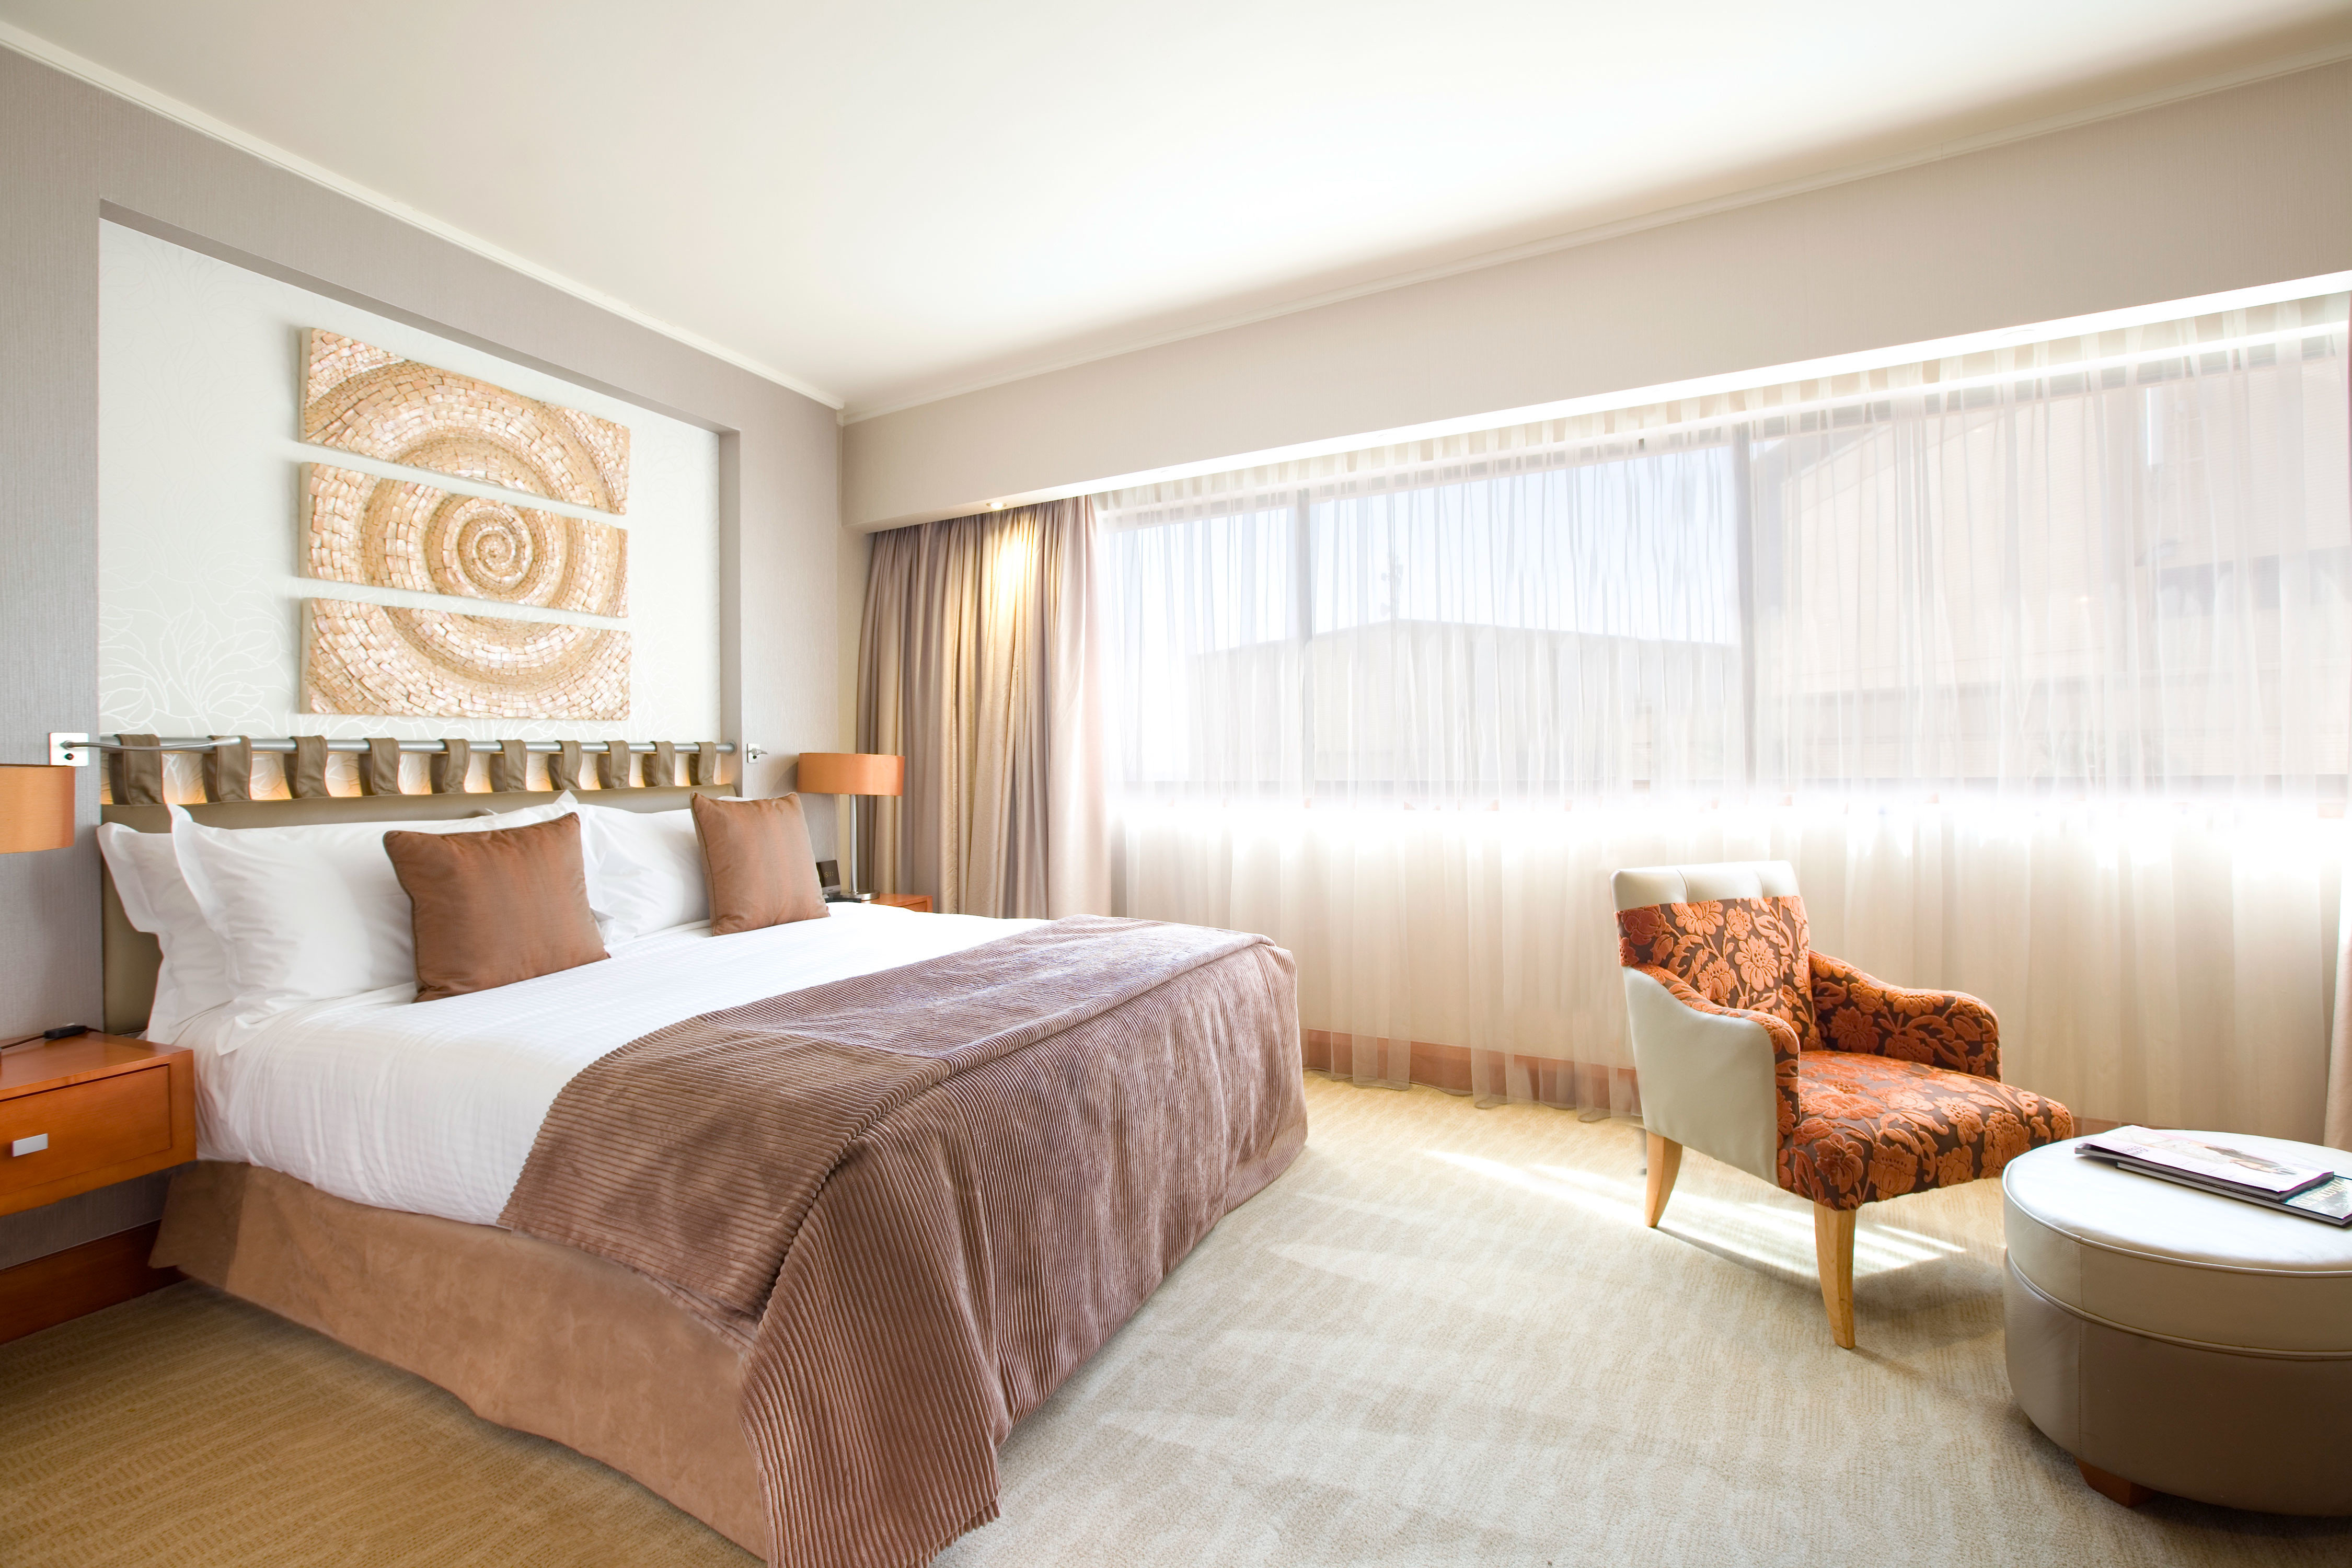 Bedroom Hip Luxury Modern Scenic views Suite sofa property living room condominium home cottage